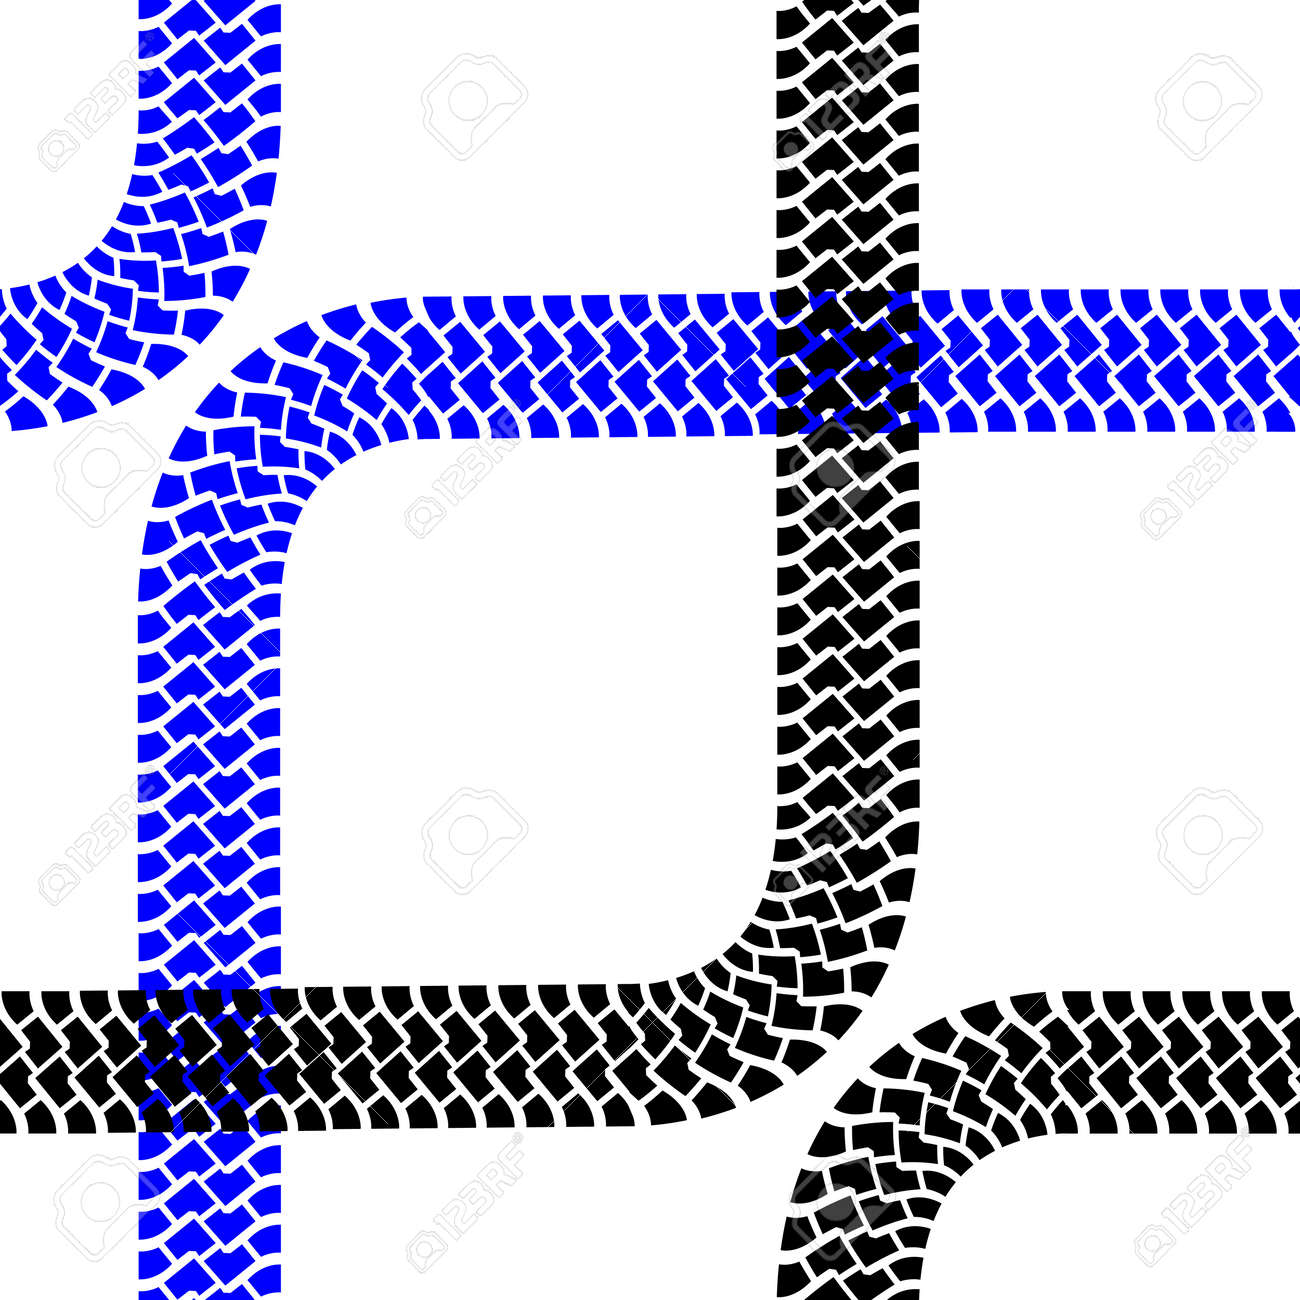 Seamless wallpaper tire tracks pattern illustration background Stock Vector - 17986989